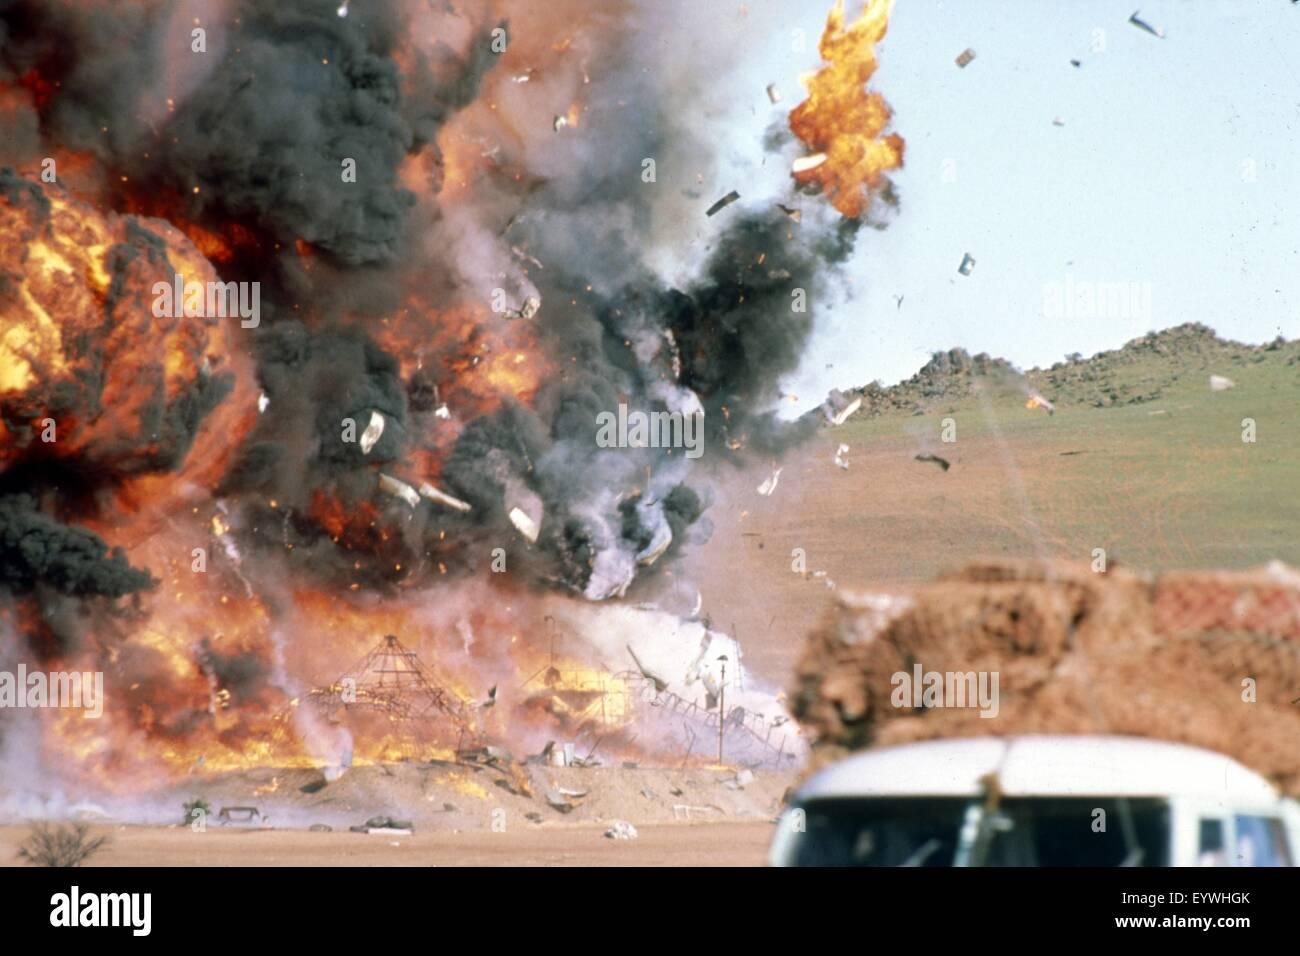 Mad Max II: The Road Warrior ; Year : 1981 Australia ; Director : George Miller ; Photo: Carolyn Johns - Stock Image